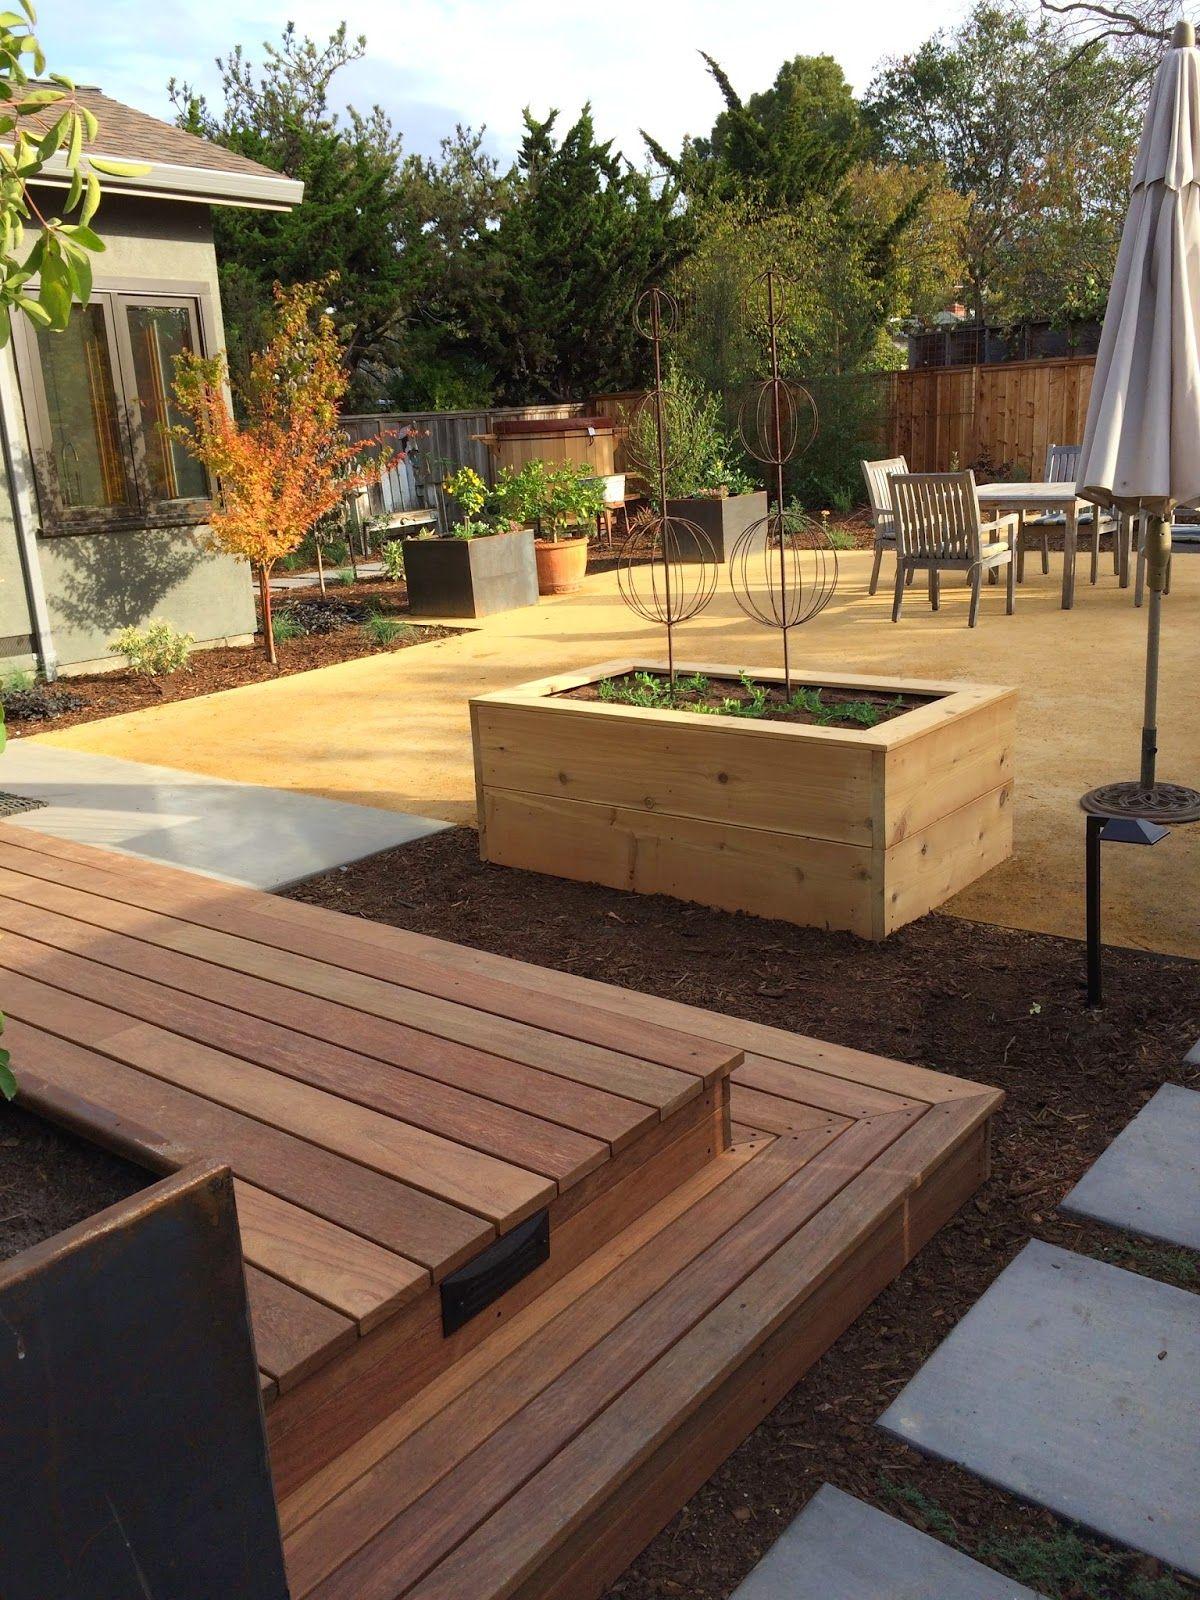 a build to basic acvap deck homes nice patio ideas plans